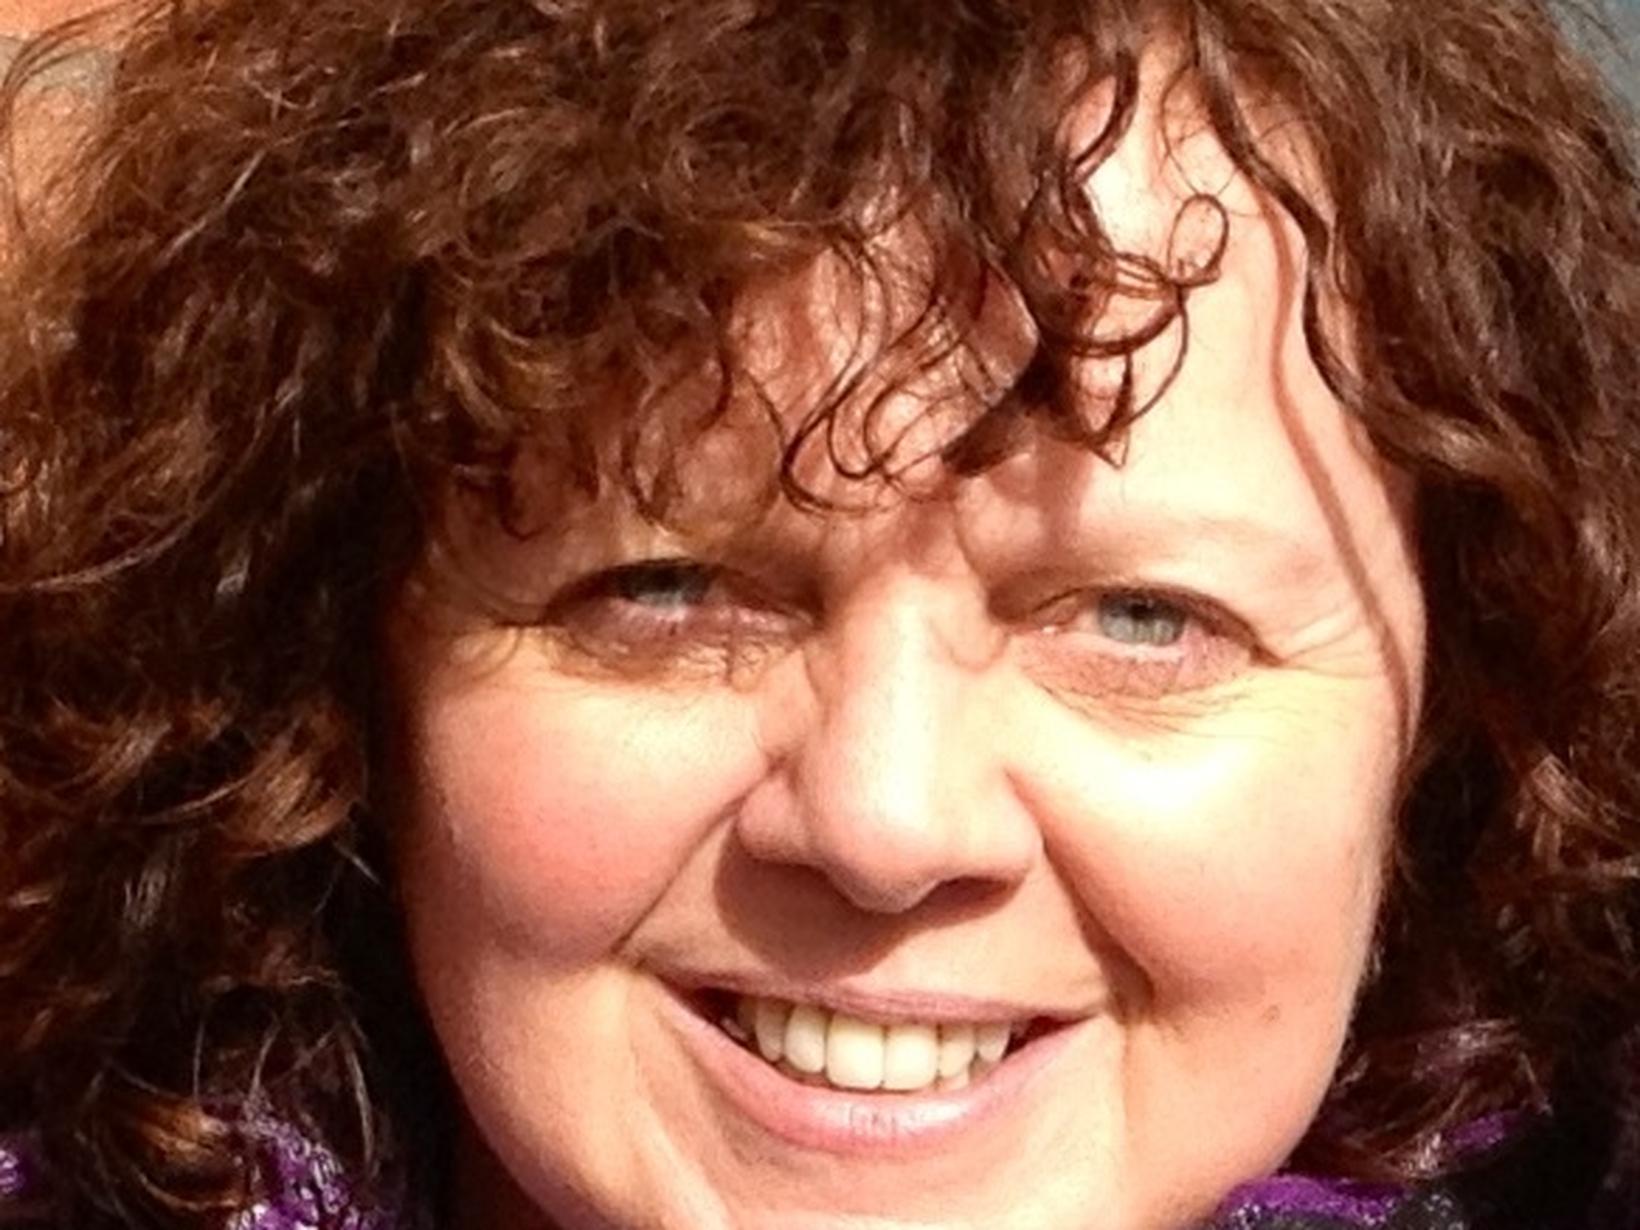 Jane from Stockport, United Kingdom